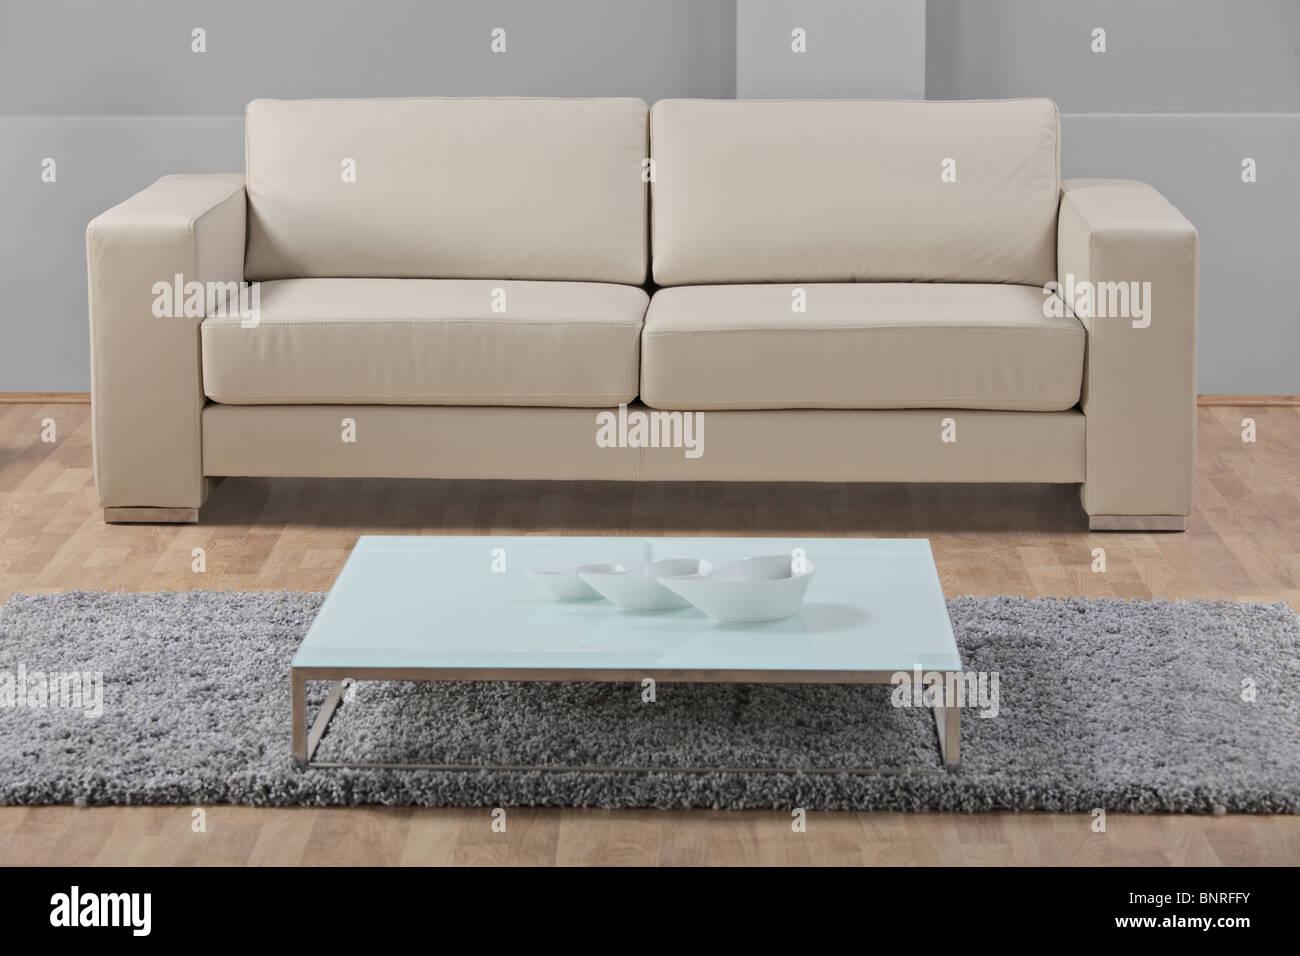 Sofa immagini sofa fotos stock alamy - Divano bianco pelle ...